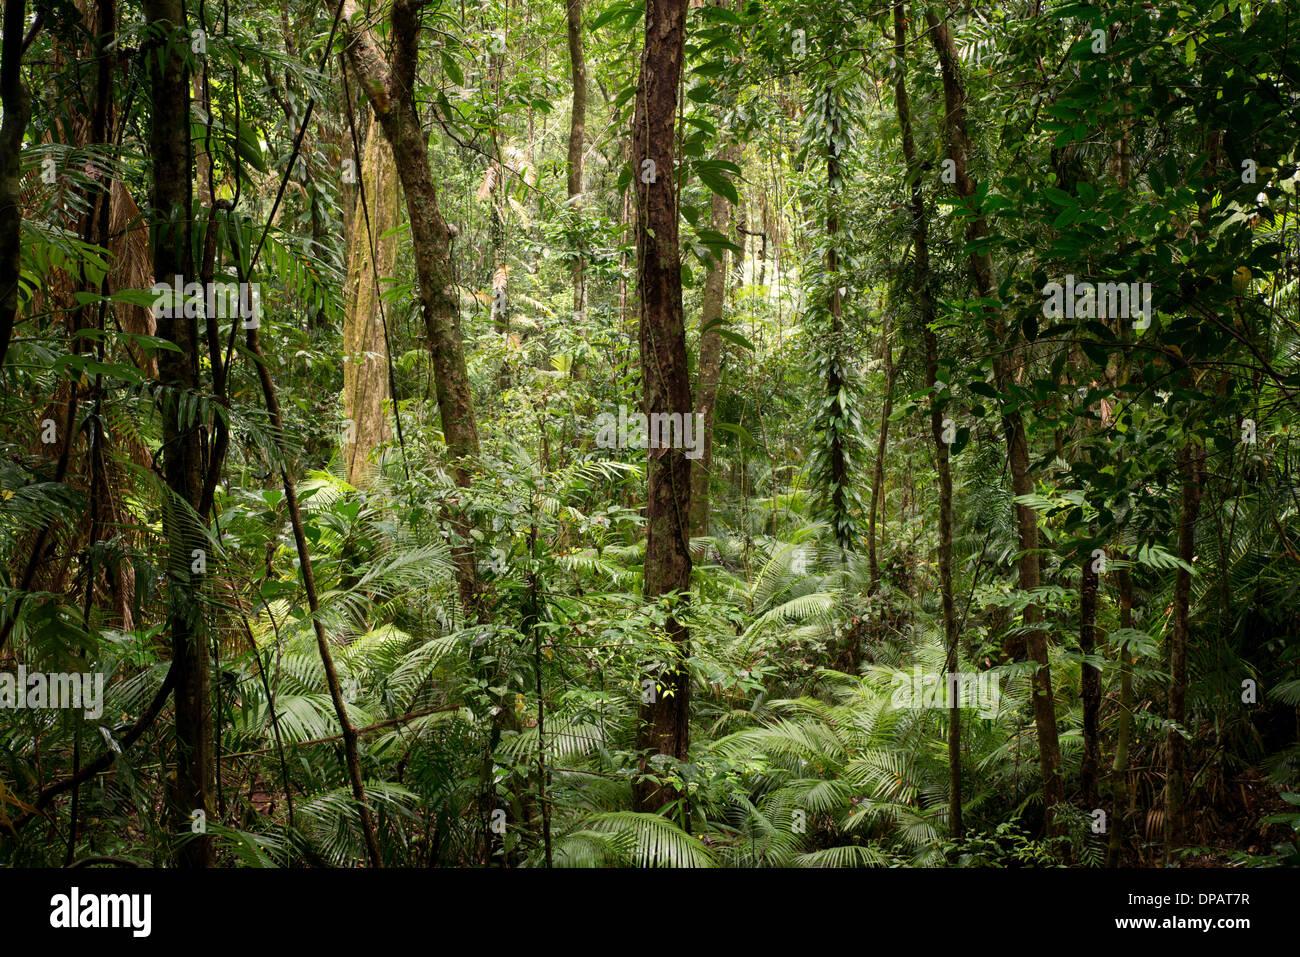 Daintree National Park, Queensland, Australia - Stock Image